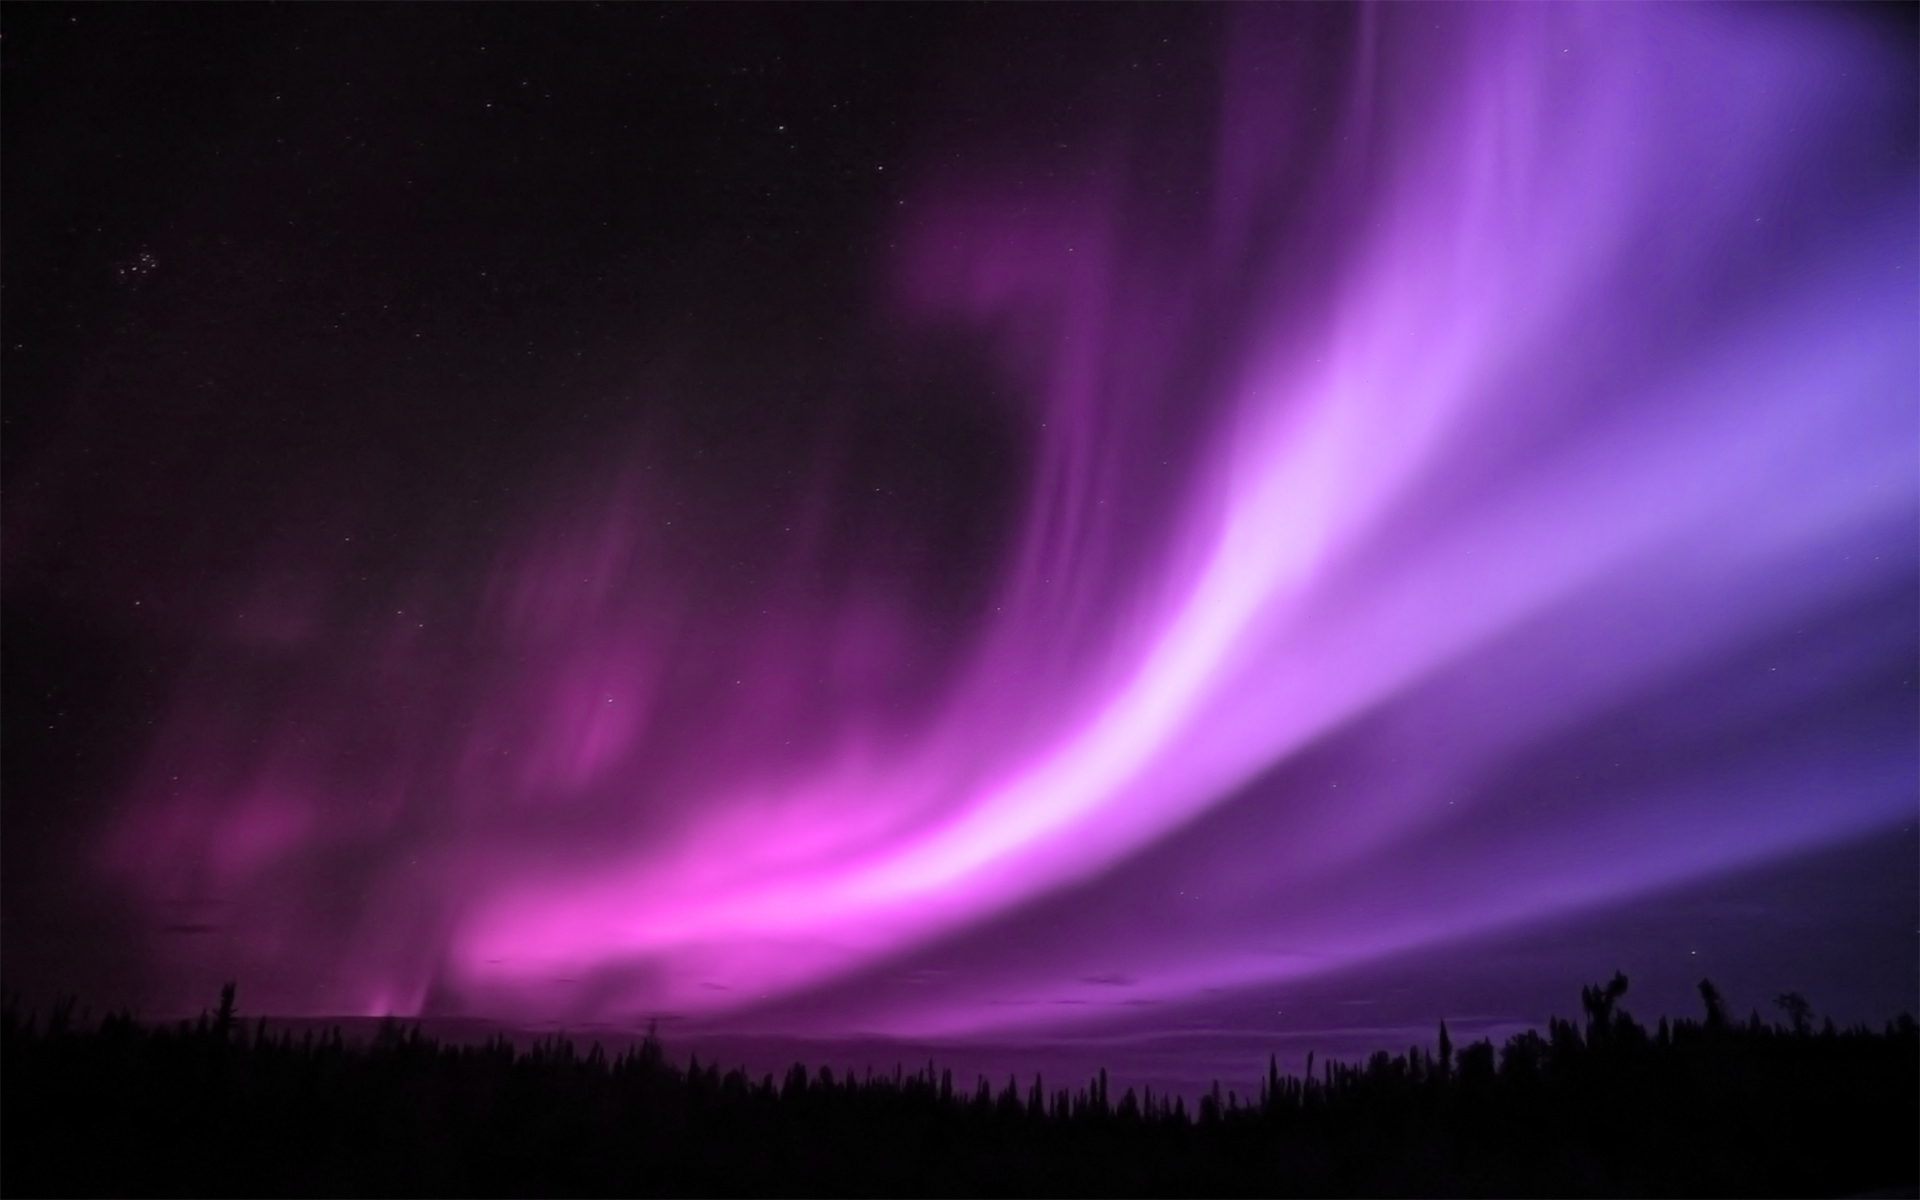 purple desktop wallpaper,sky,purple,violet,aurora,nature